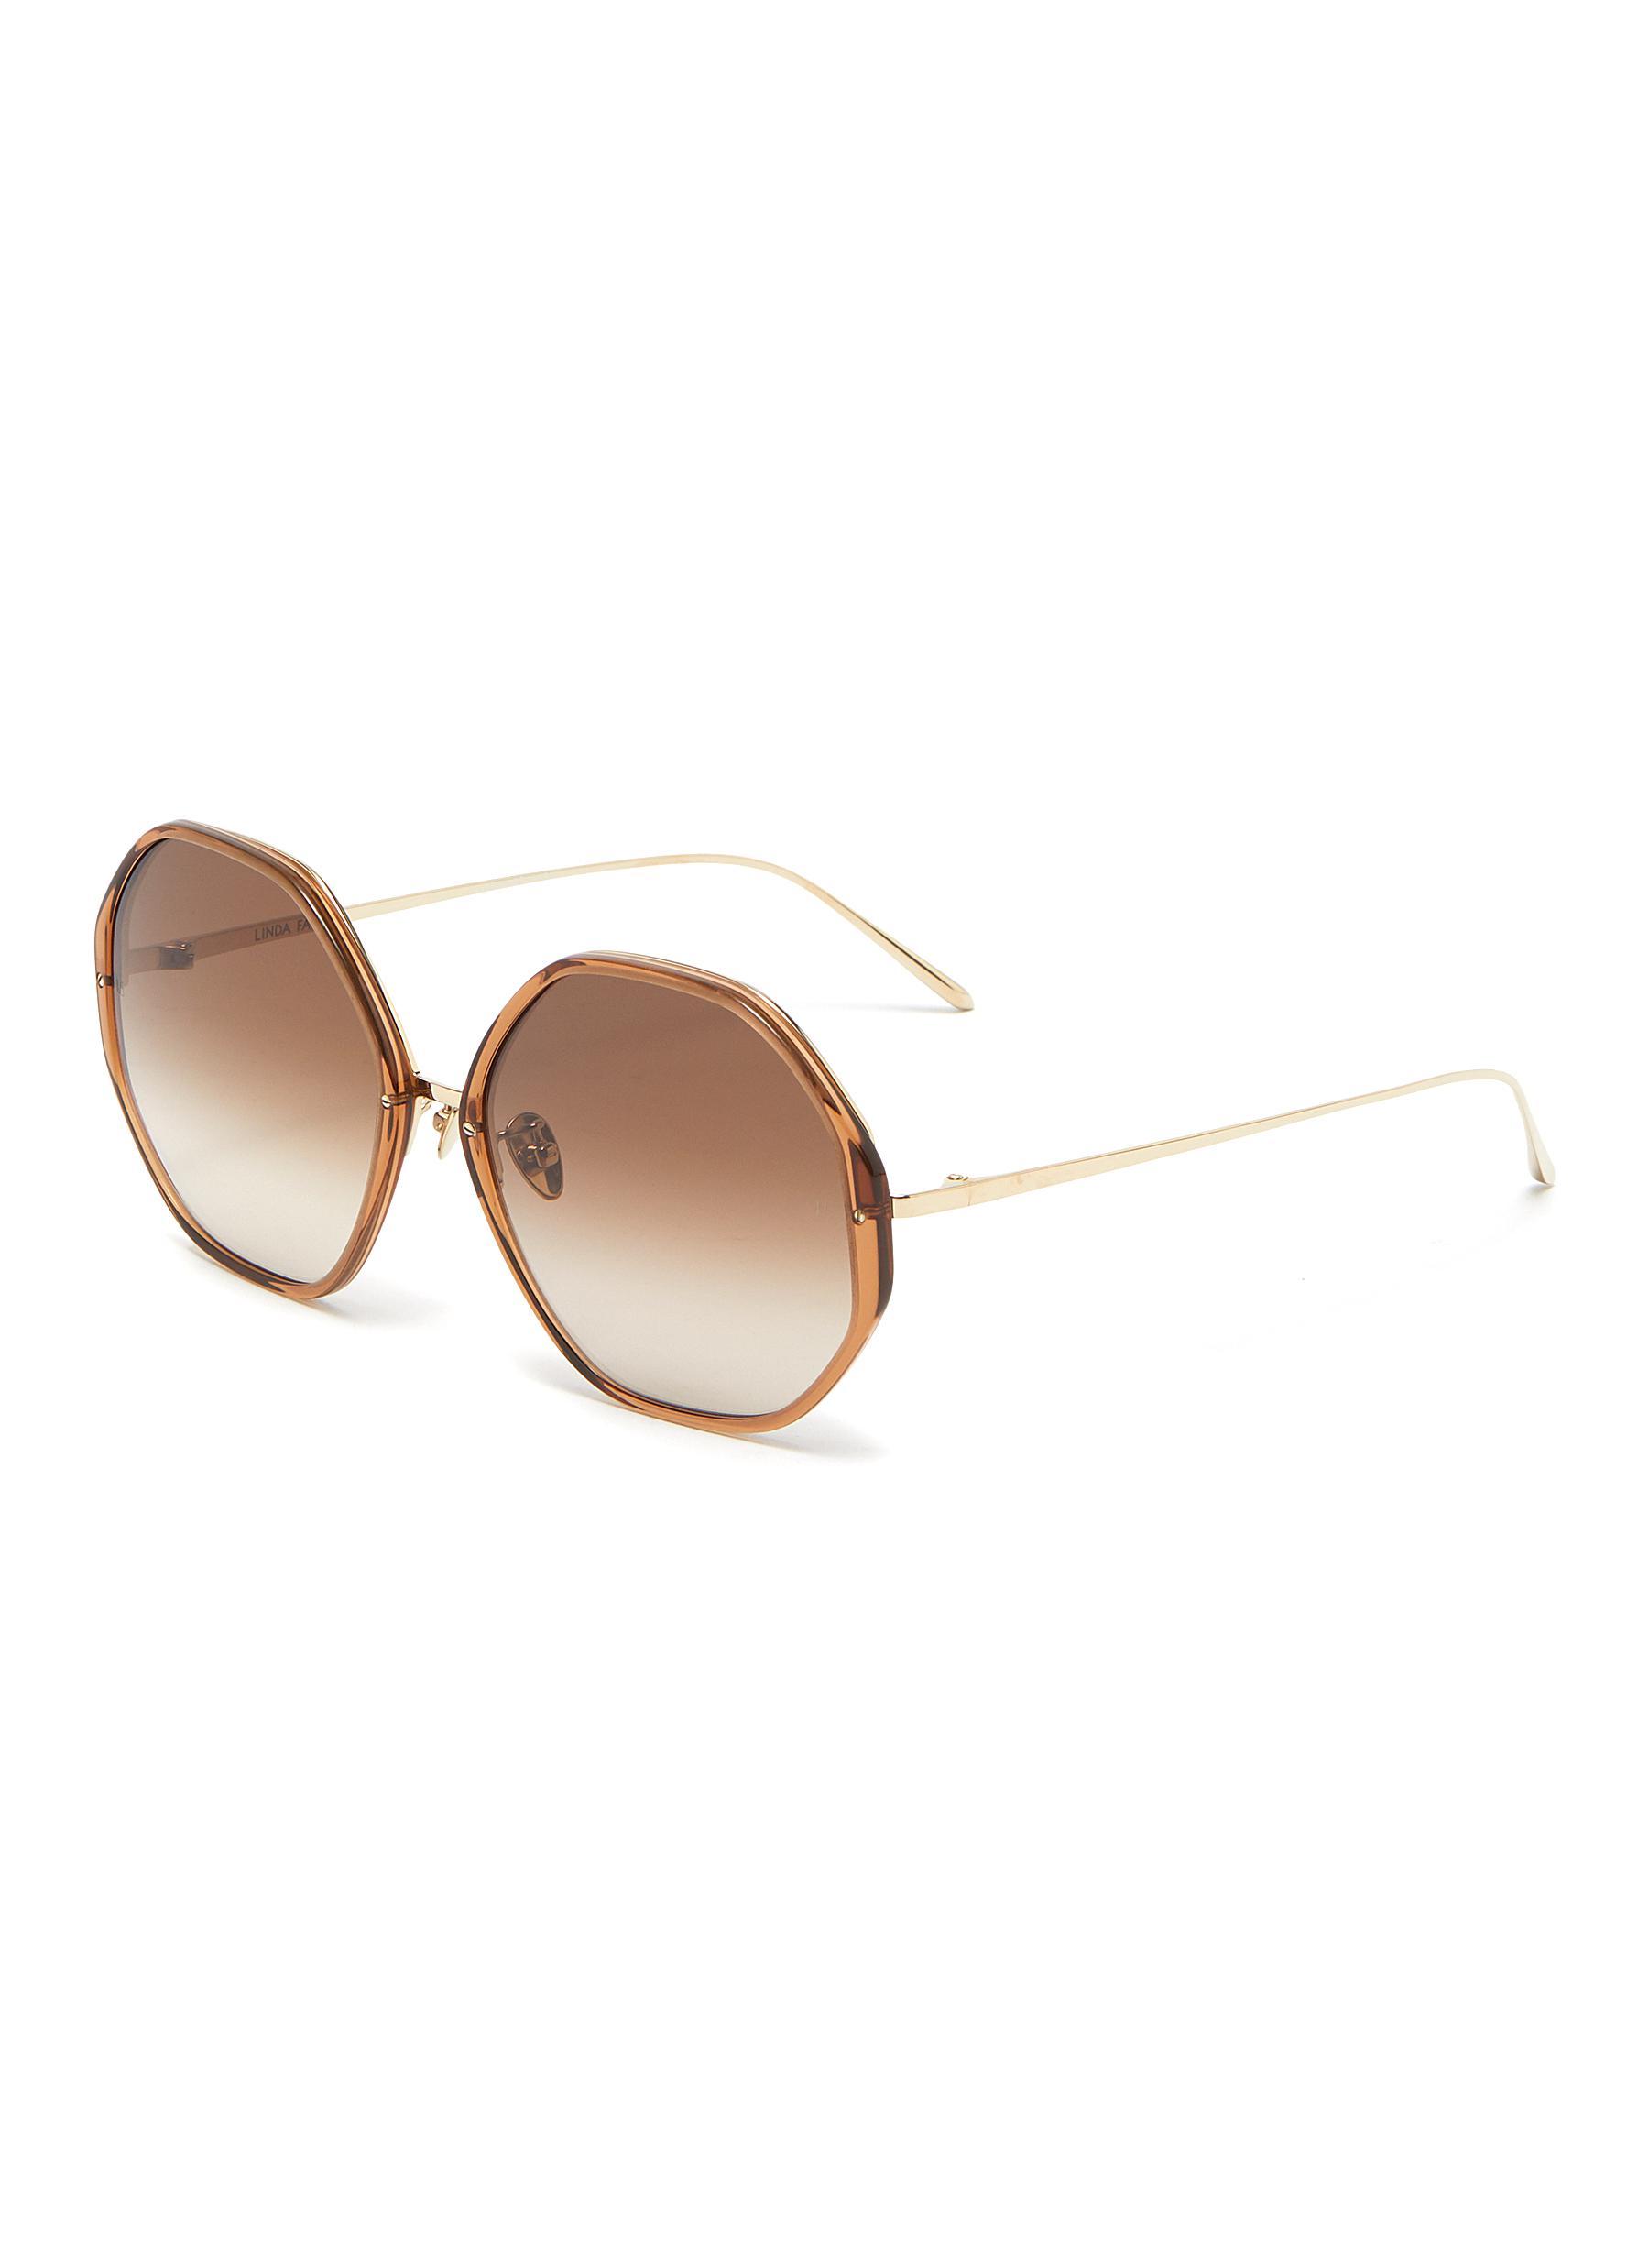 'Alona' Oversized Duo-tonal Hexagonal Frame Sunglasses